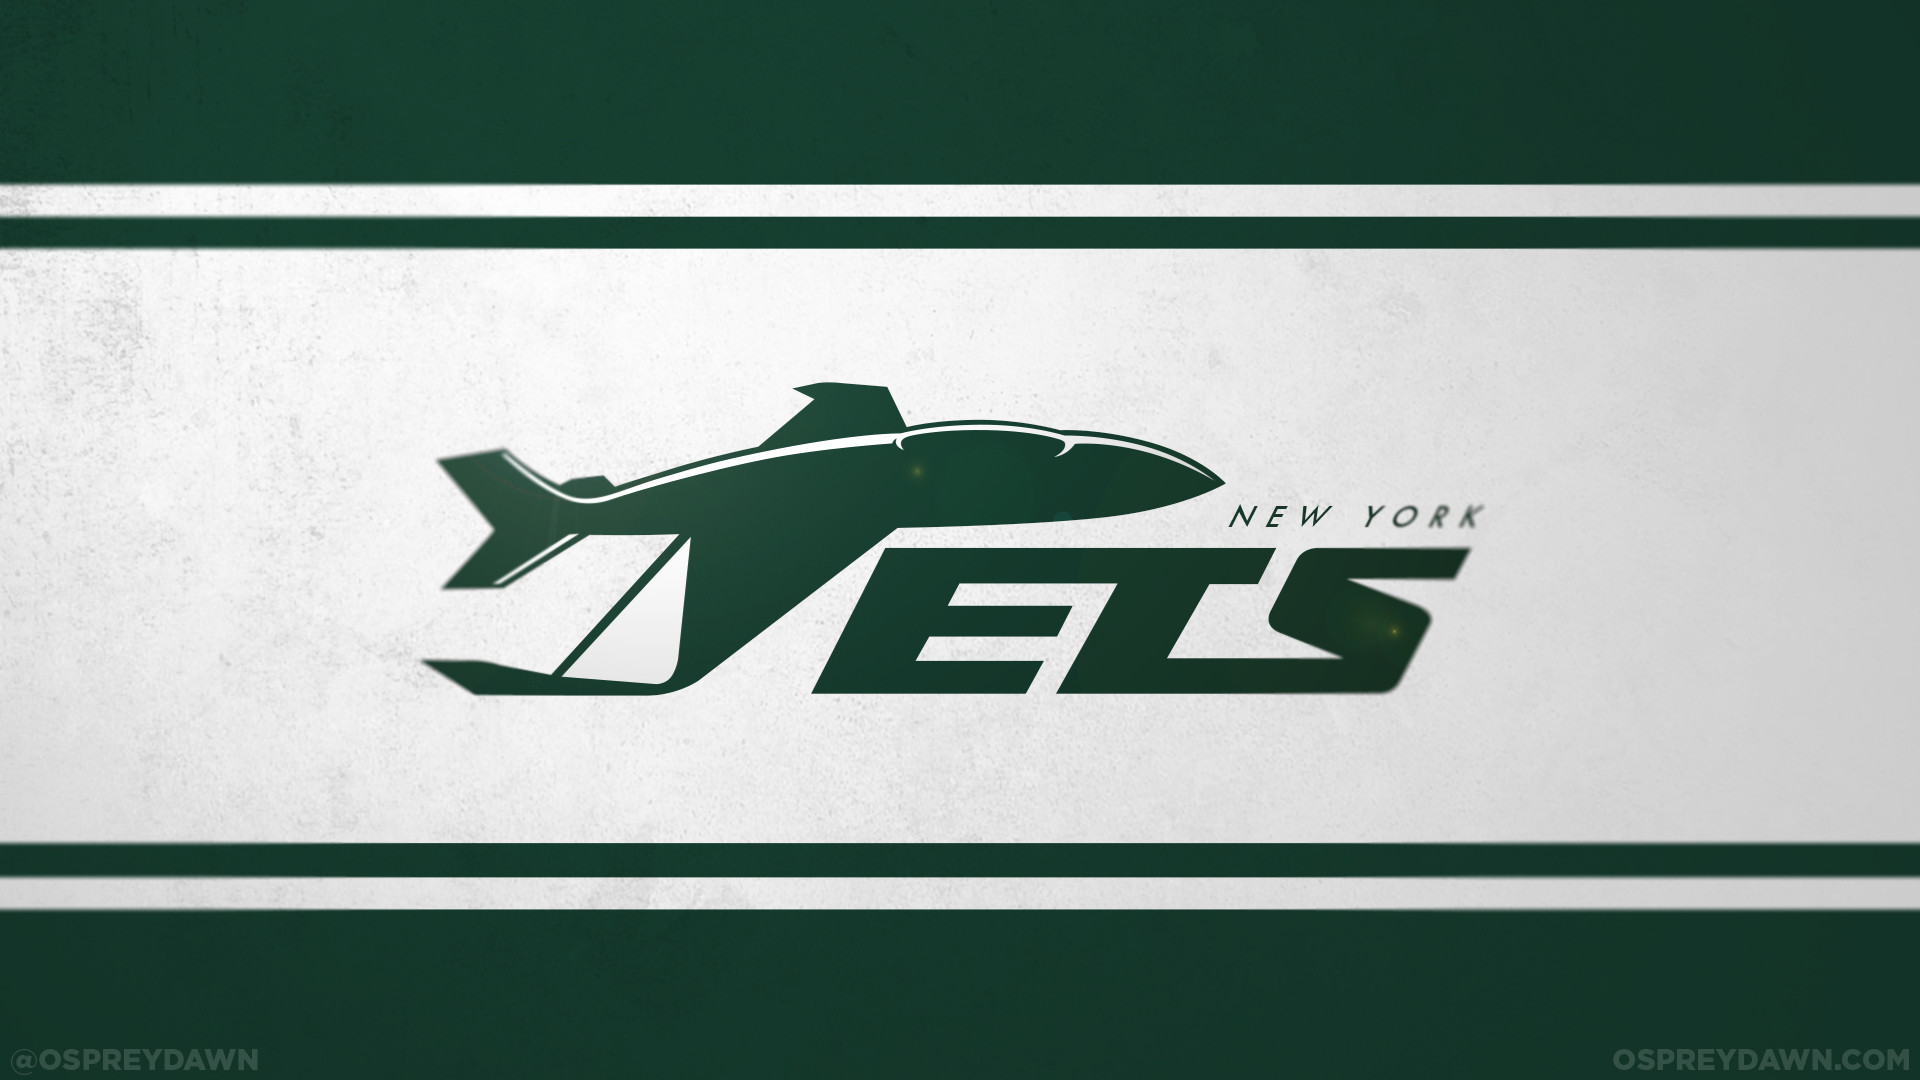 NEW YORK JETS nfl football t wallpaper background